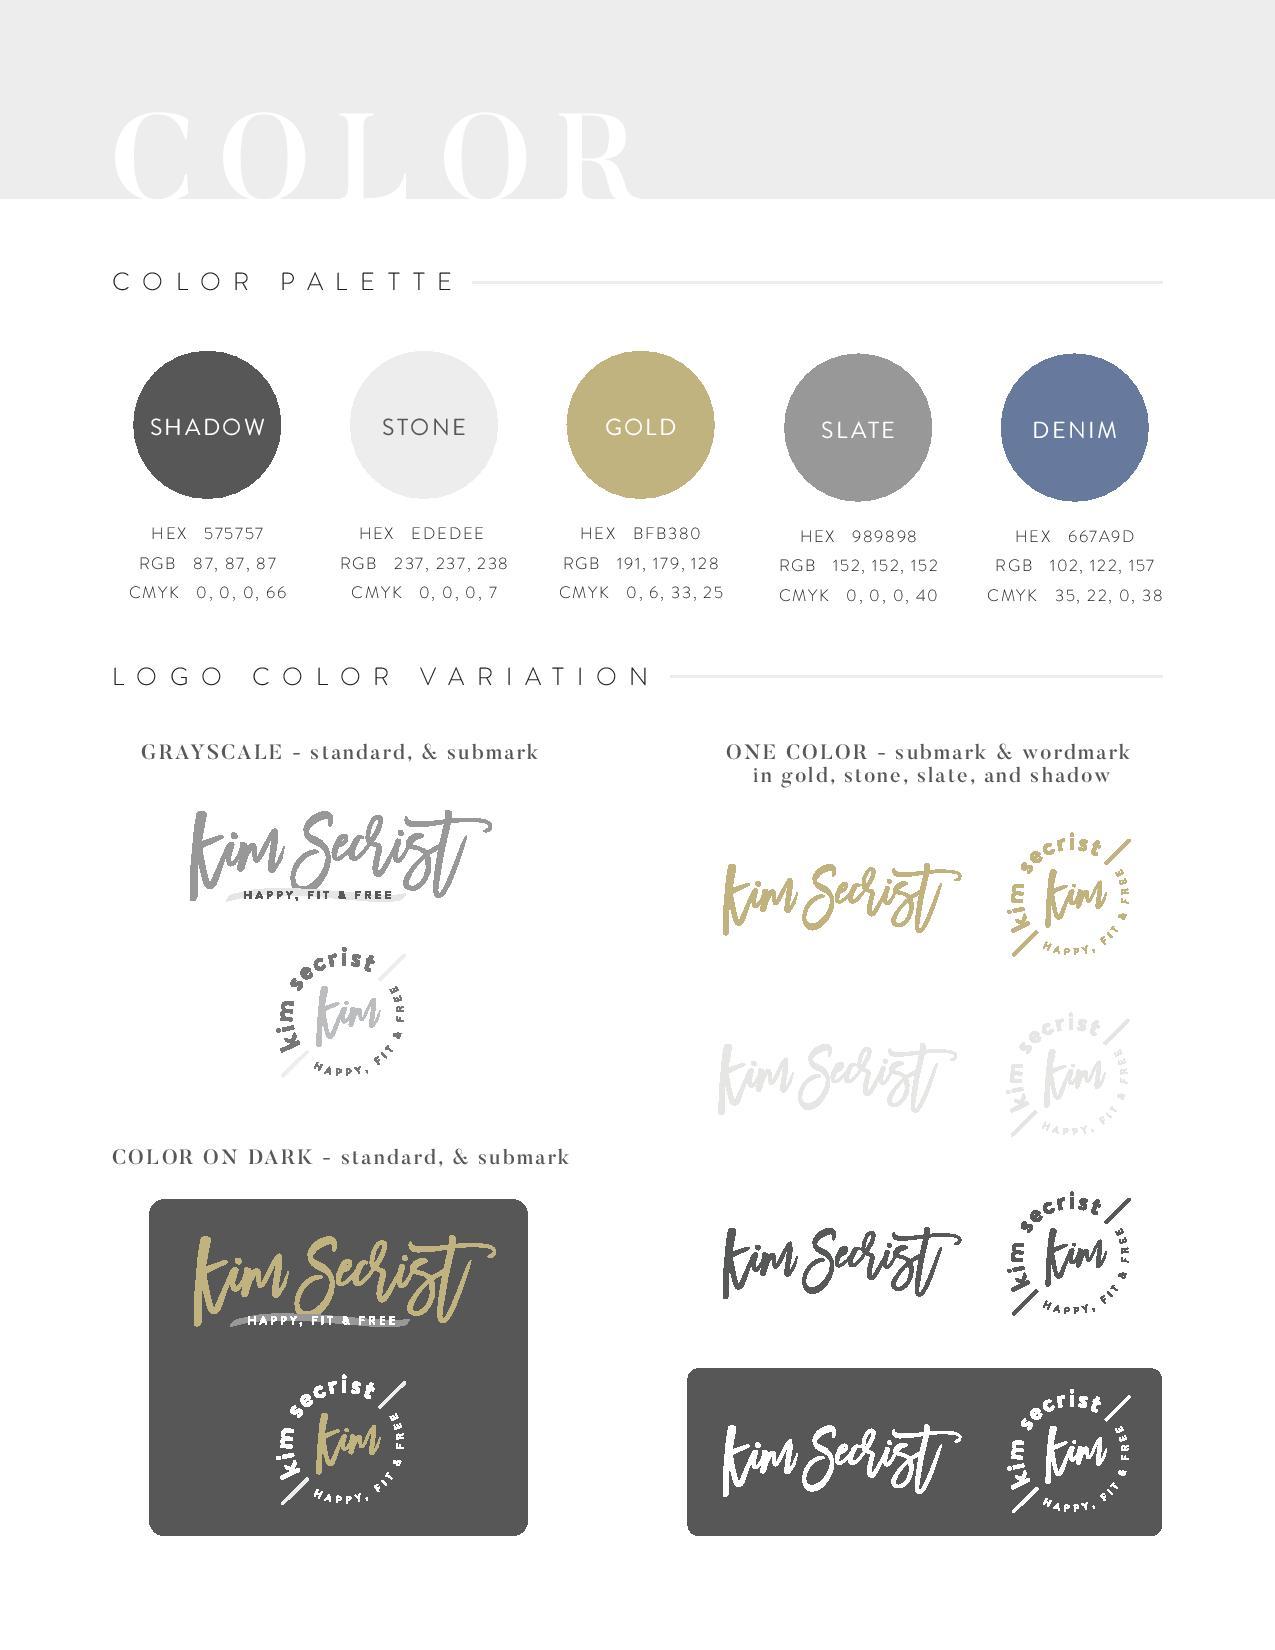 Kim Secrist Brand Guide-page-003.jpg